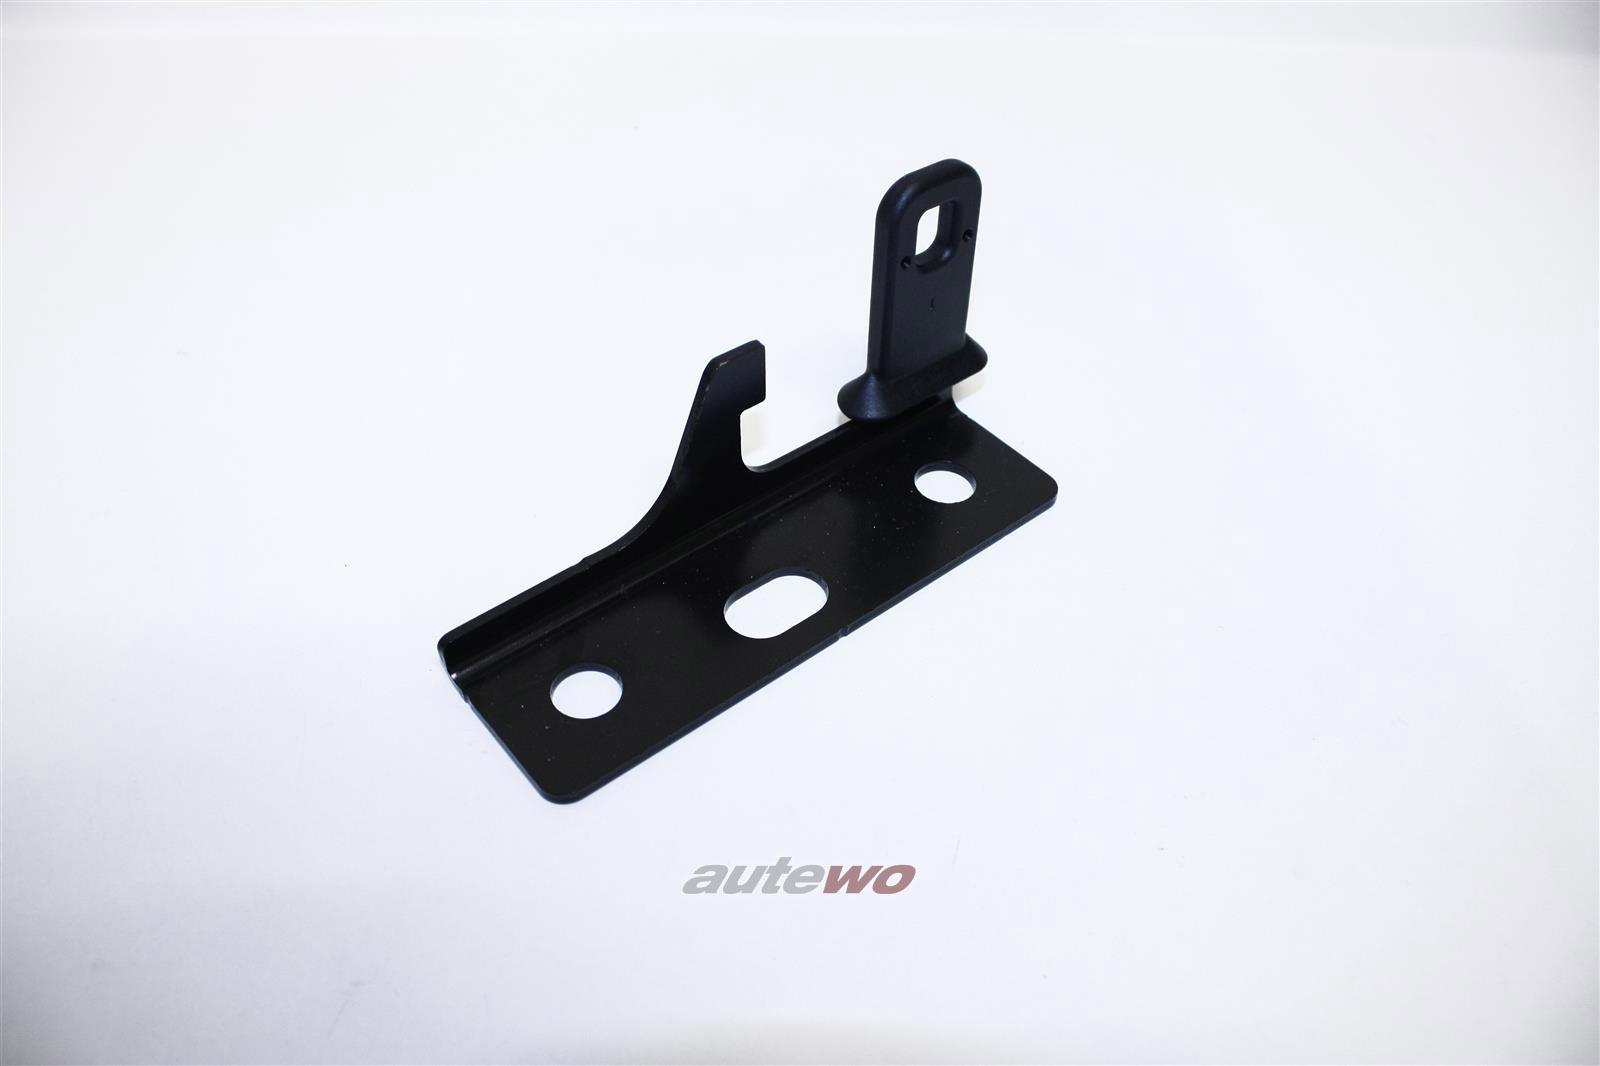 NEU & ORIGINAL! Audi A4/S4/RS4 8H Cabrio Zugschlaufe Verdeckkastendeckel Links 8H0825435